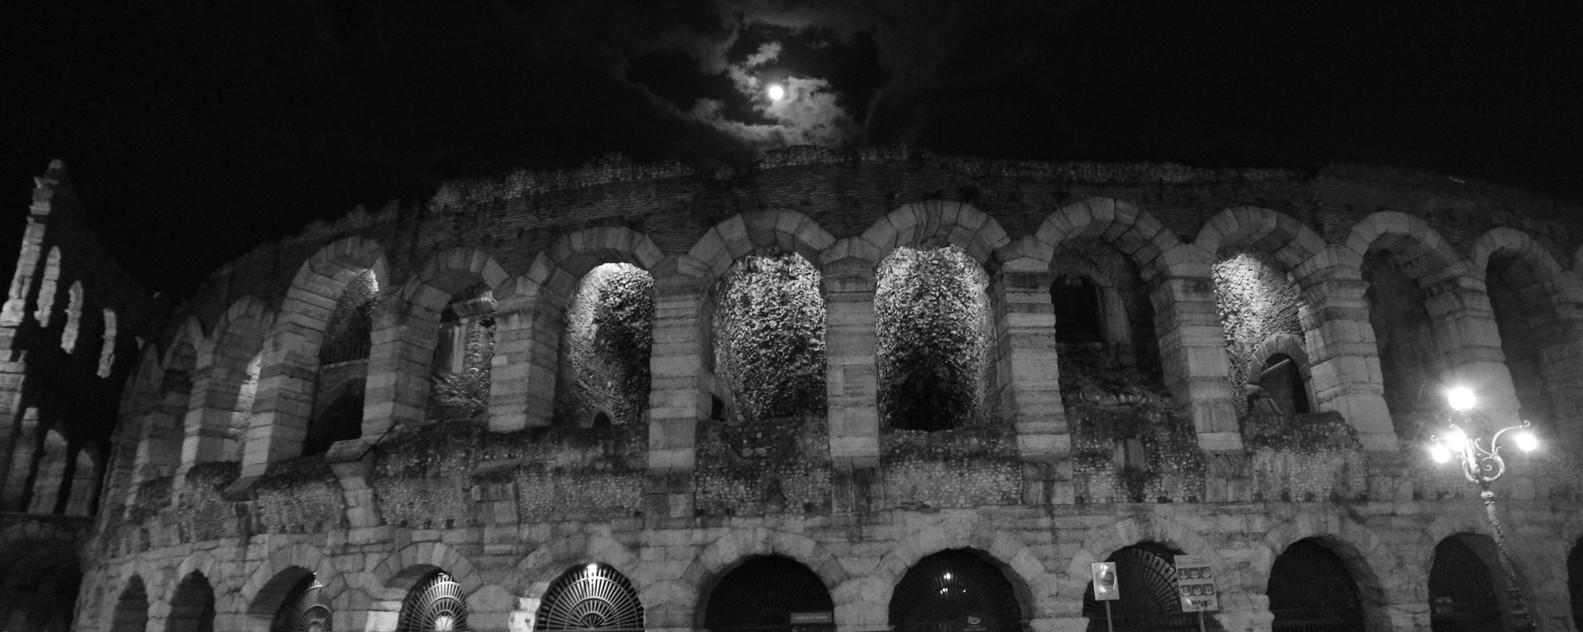 Analisi turistica Verona